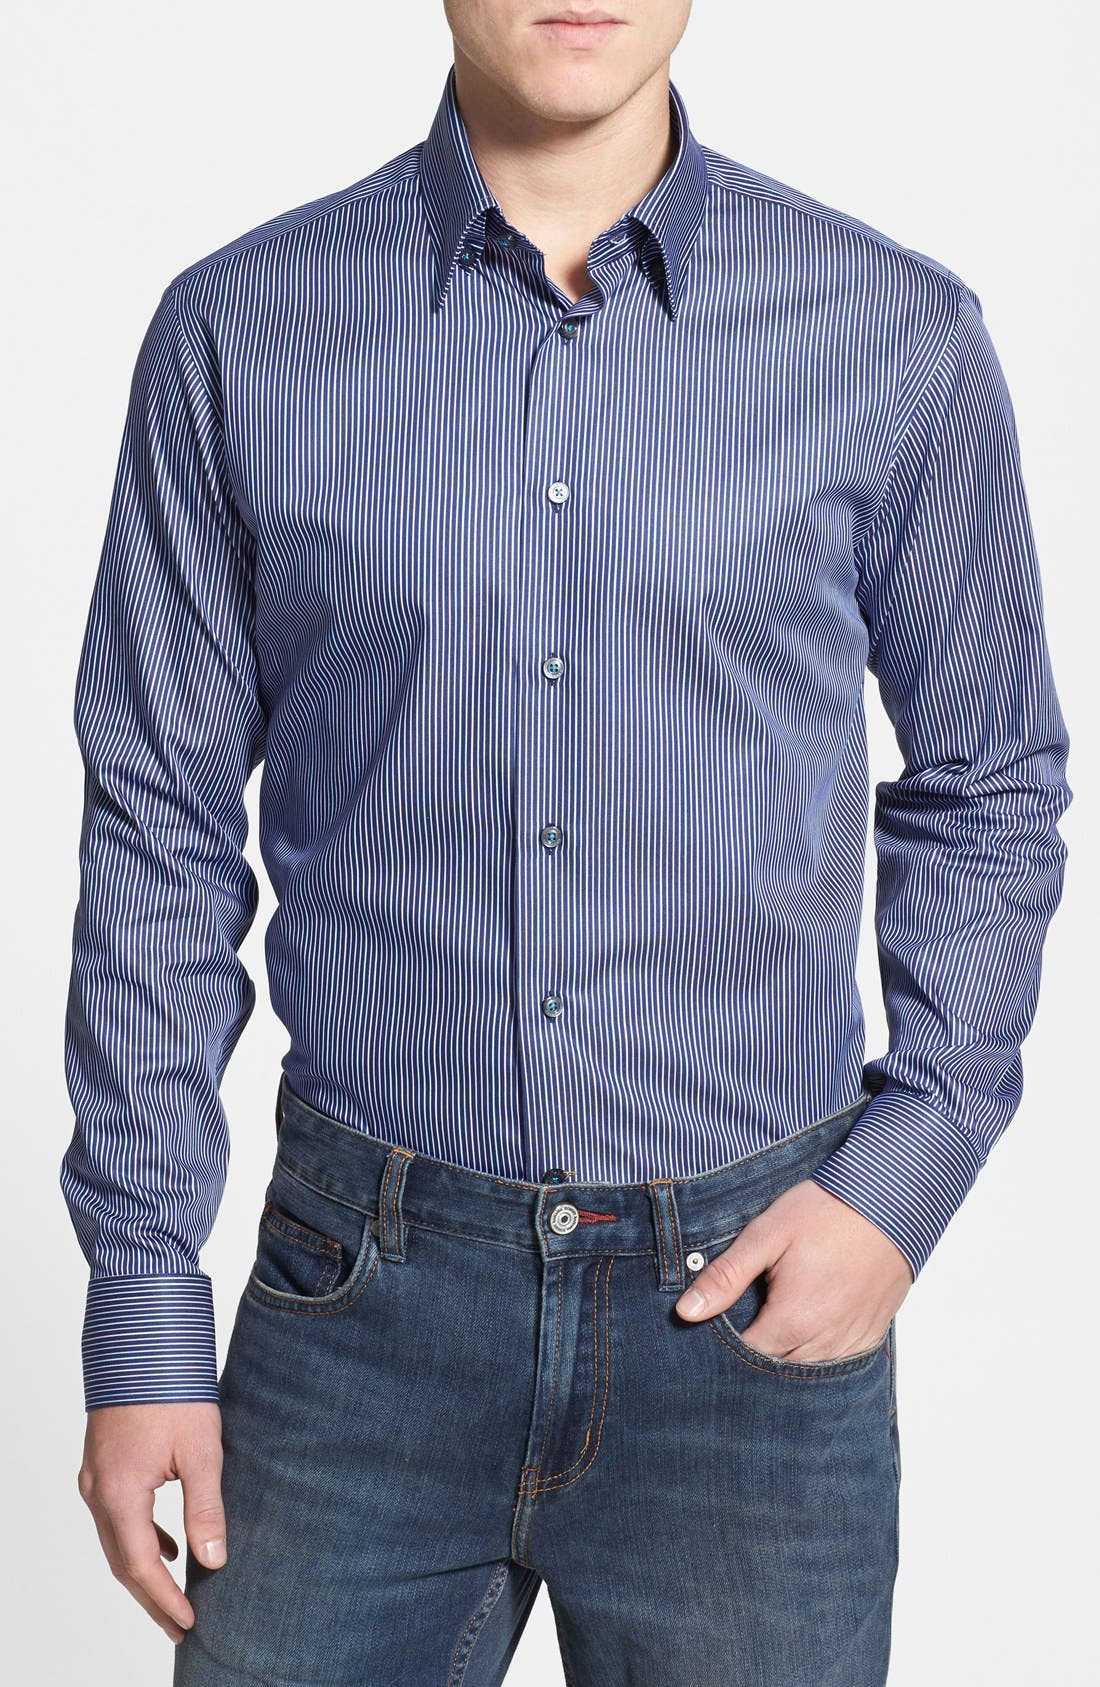 Main Image - Robert Talbott Trim Fit Stripe Woven Sport Shirt